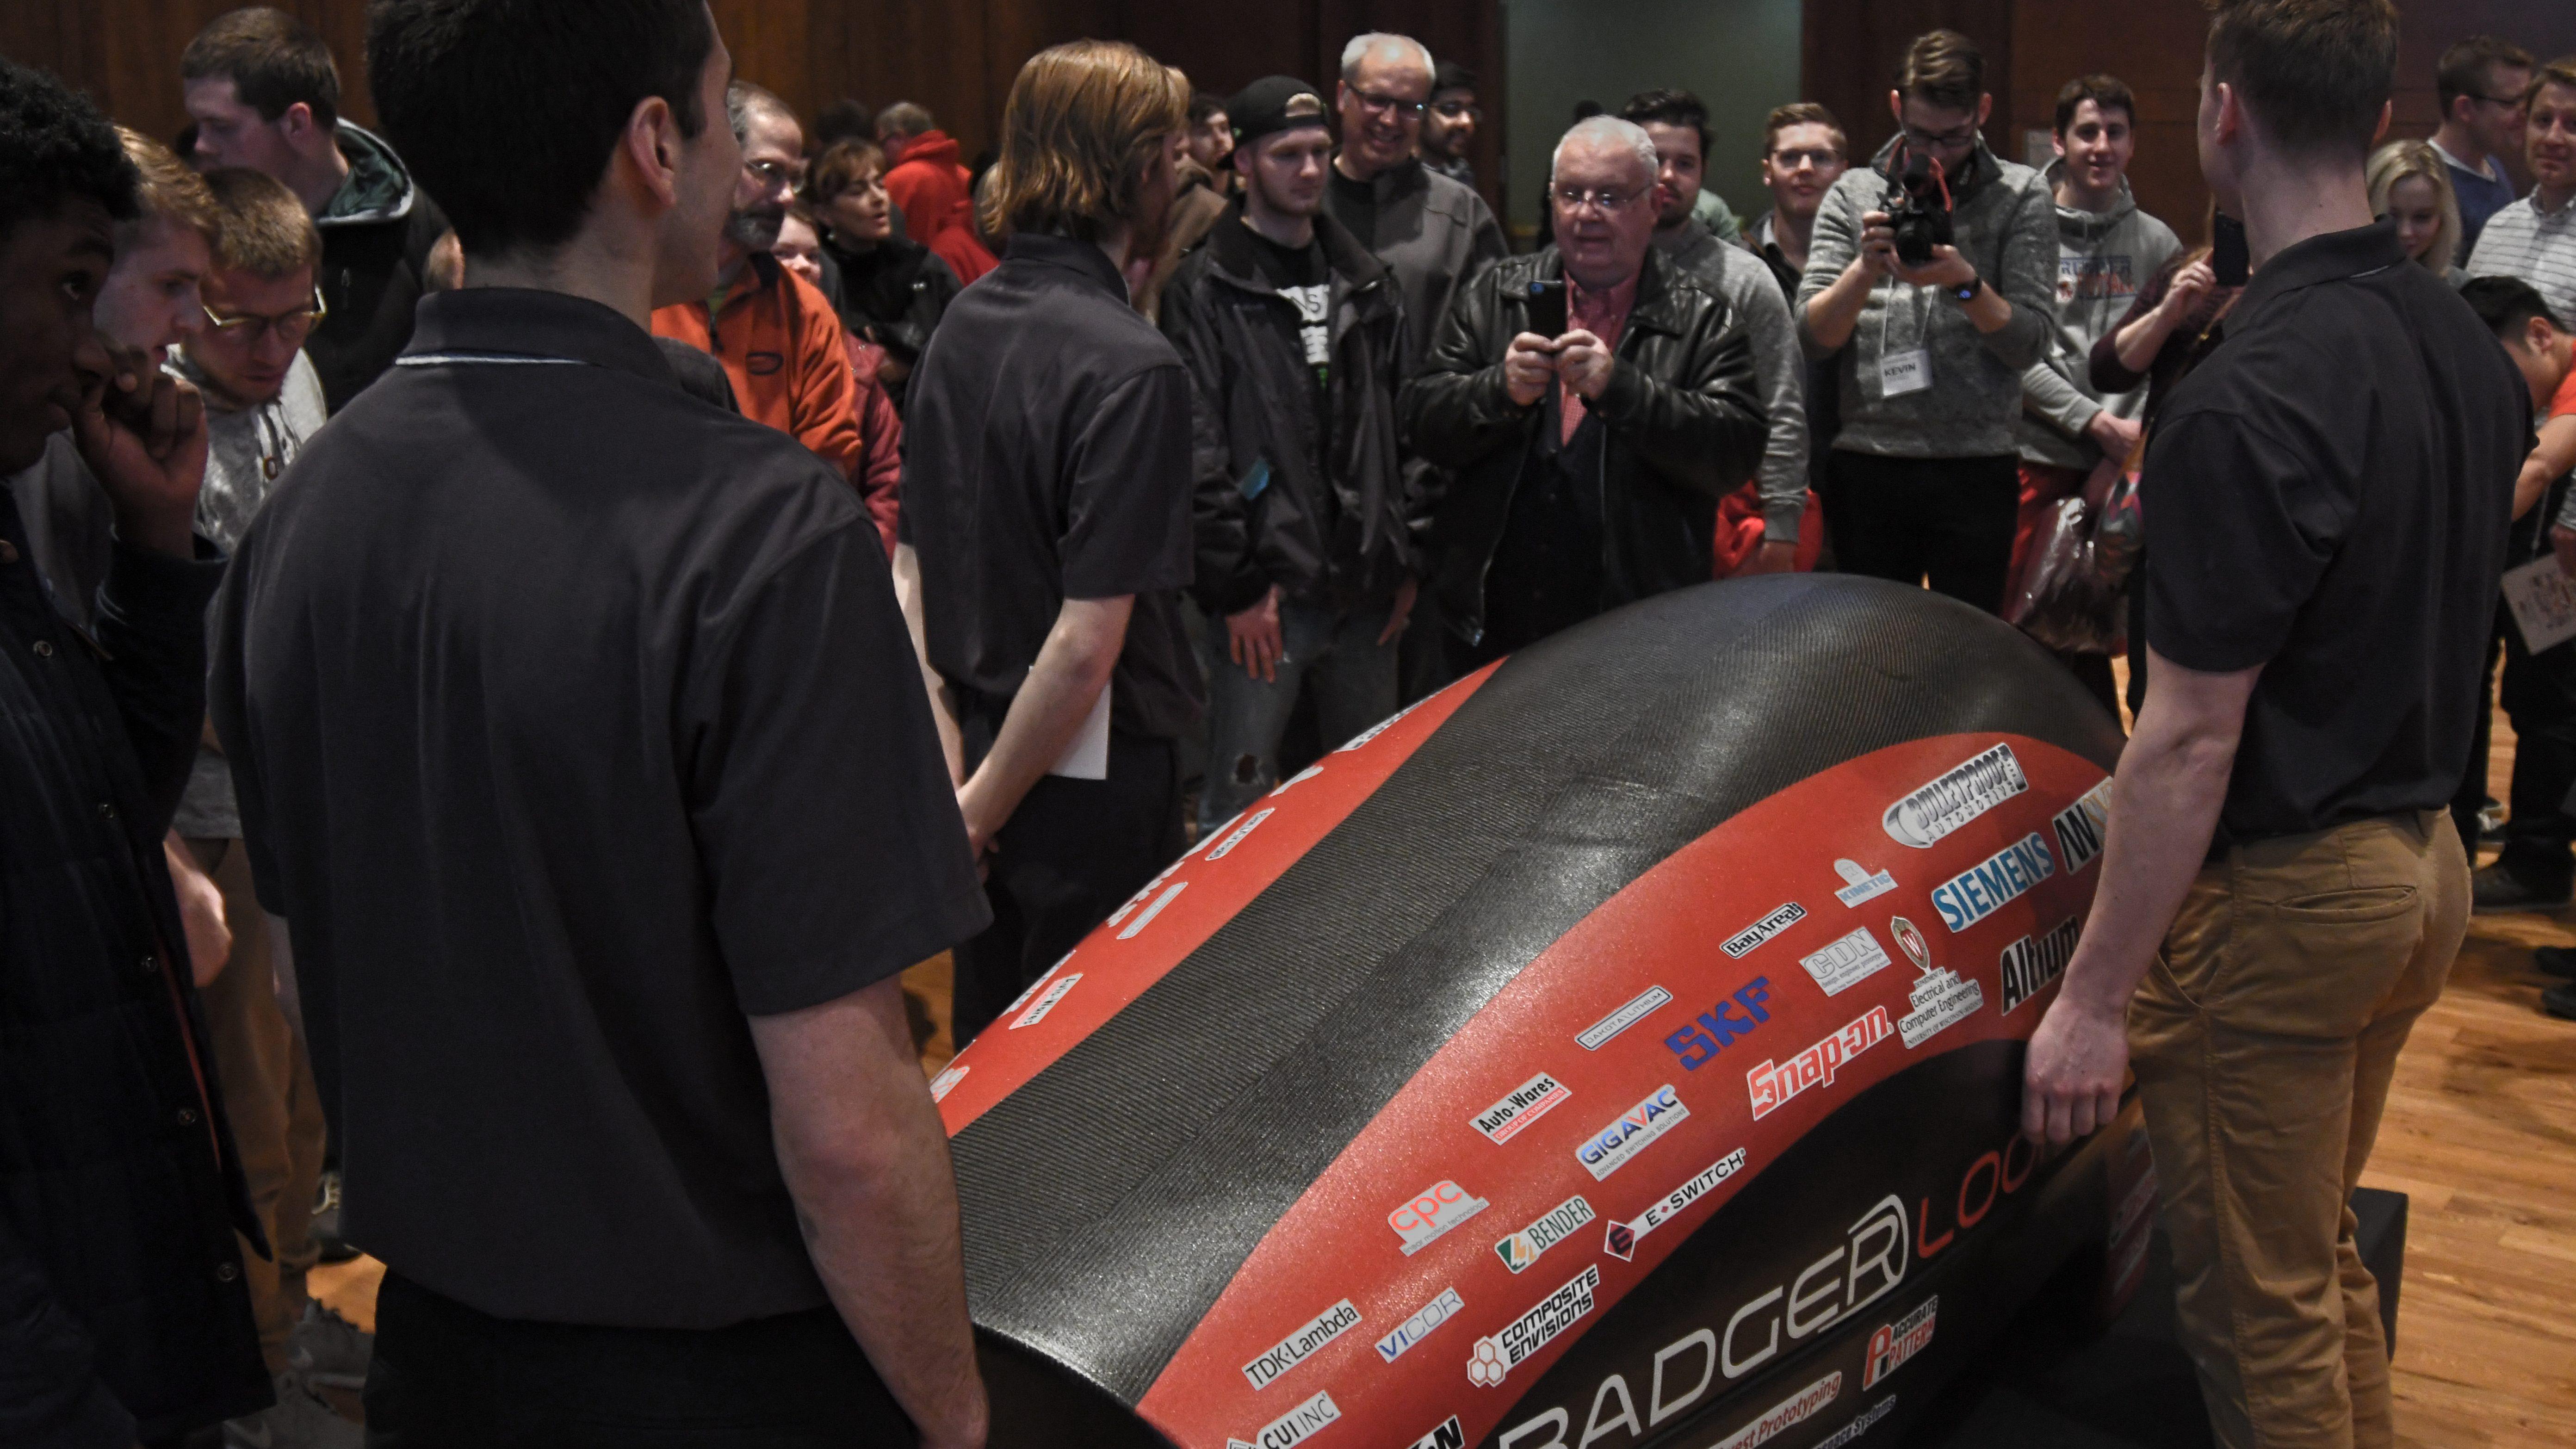 Badgerloop Hyperloop Unveiling Ceremony